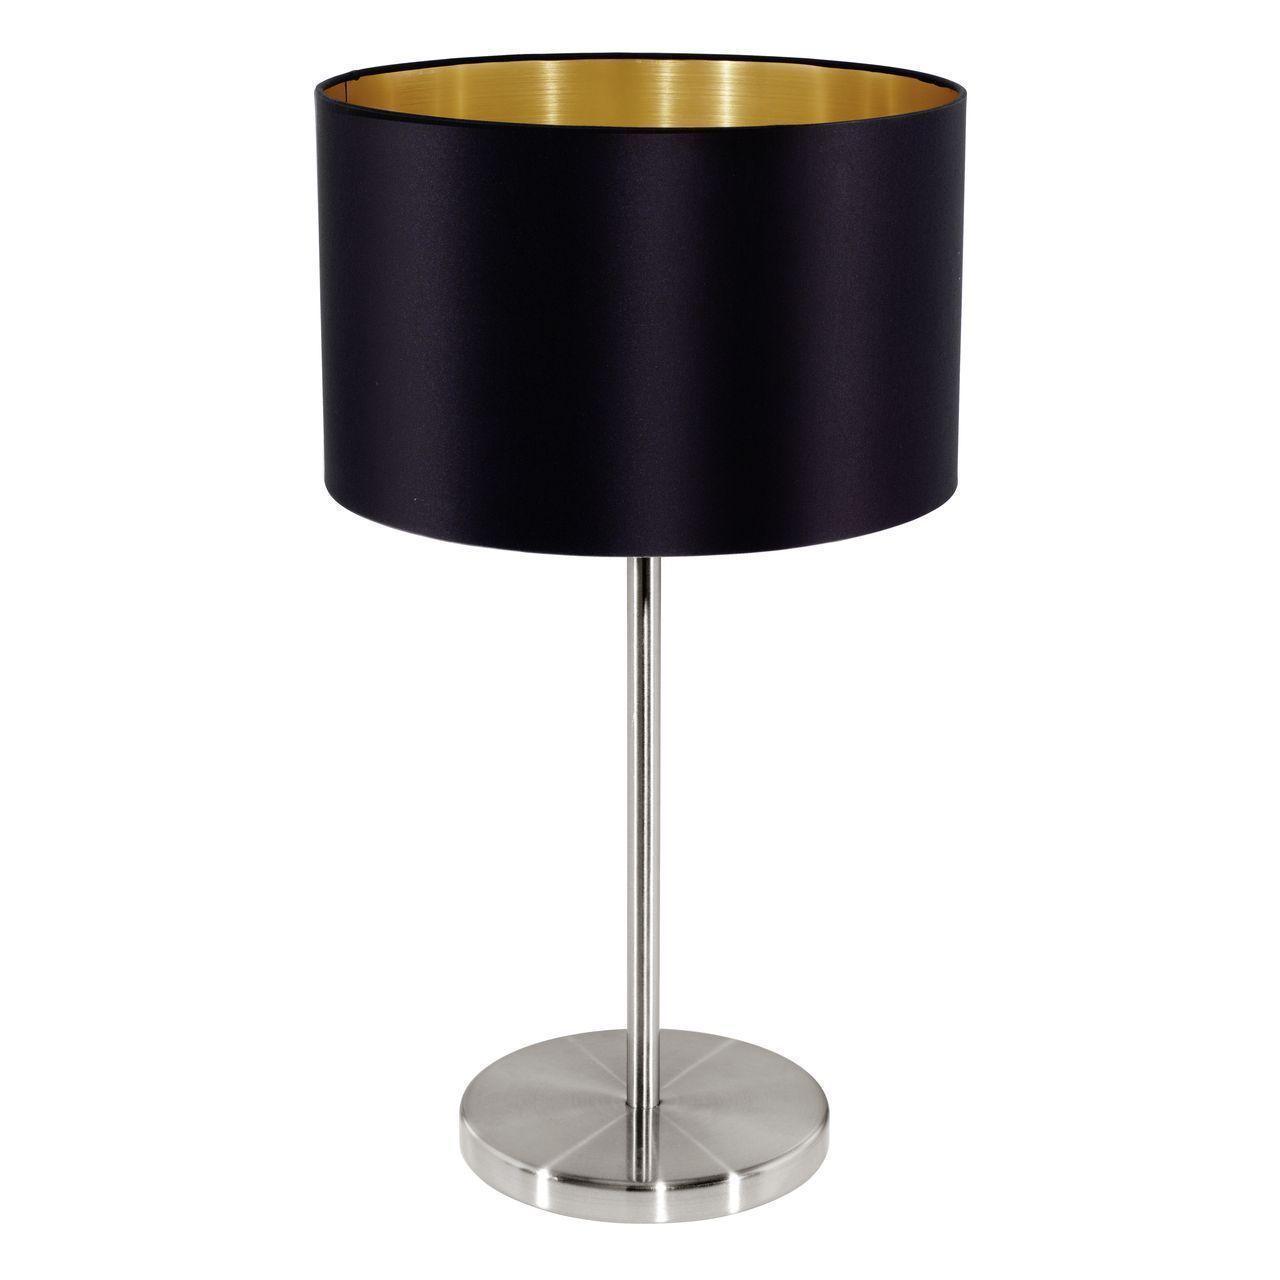 Настольная лампа Eglo Maserlo 31627 eglo настольная лампа декоративная maserlo